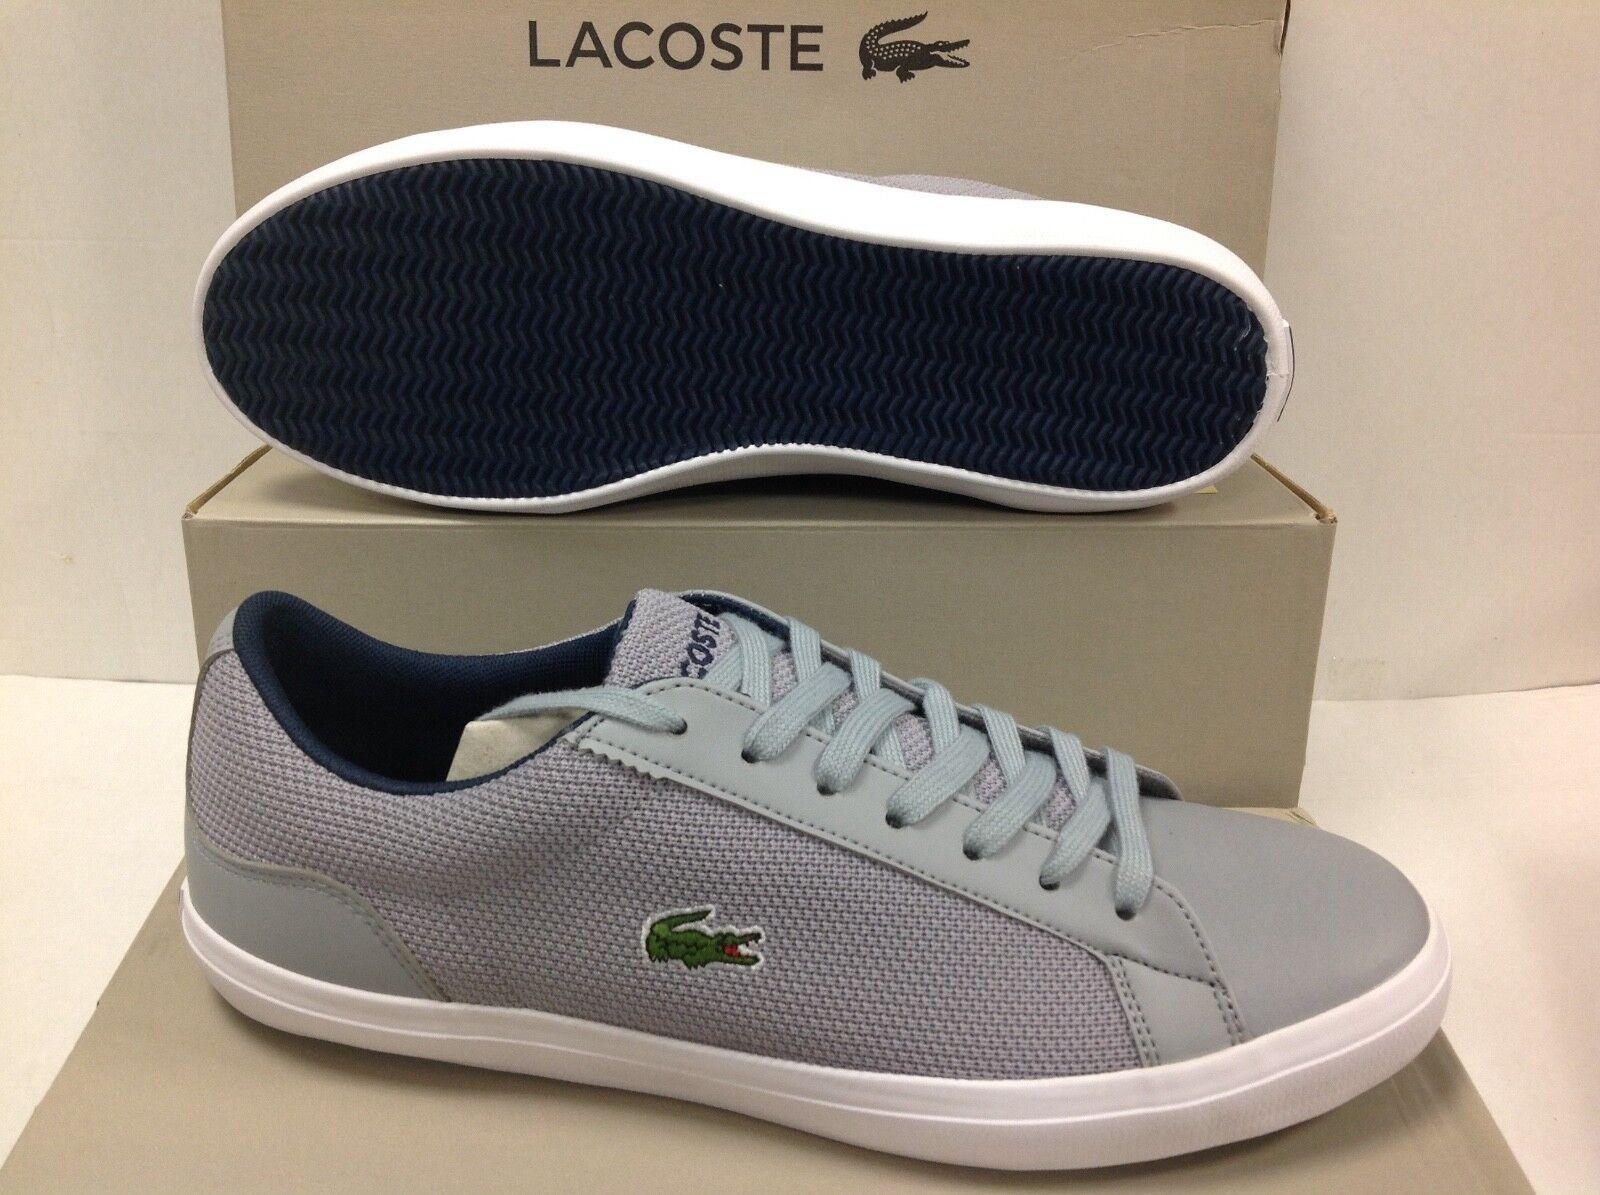 Lacoste LEROND 117 Men's Sneakers Trainers, Size UK 10   EU 44.5   USA 11